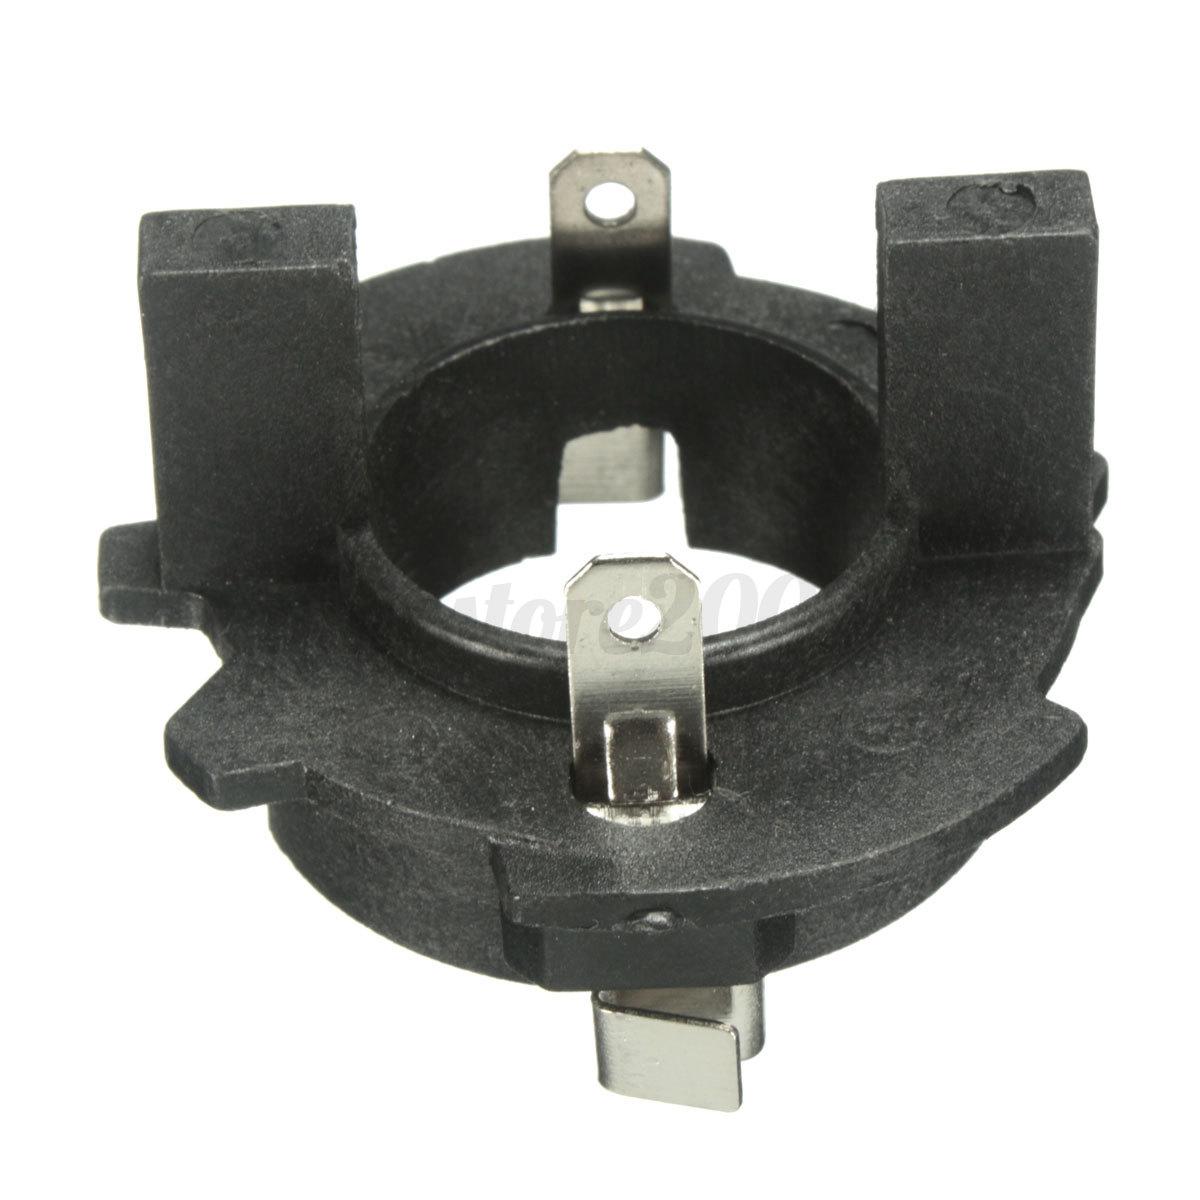 H7 Headlight Bulb Socket : Hid h bulb headlight socket holders adapters connector